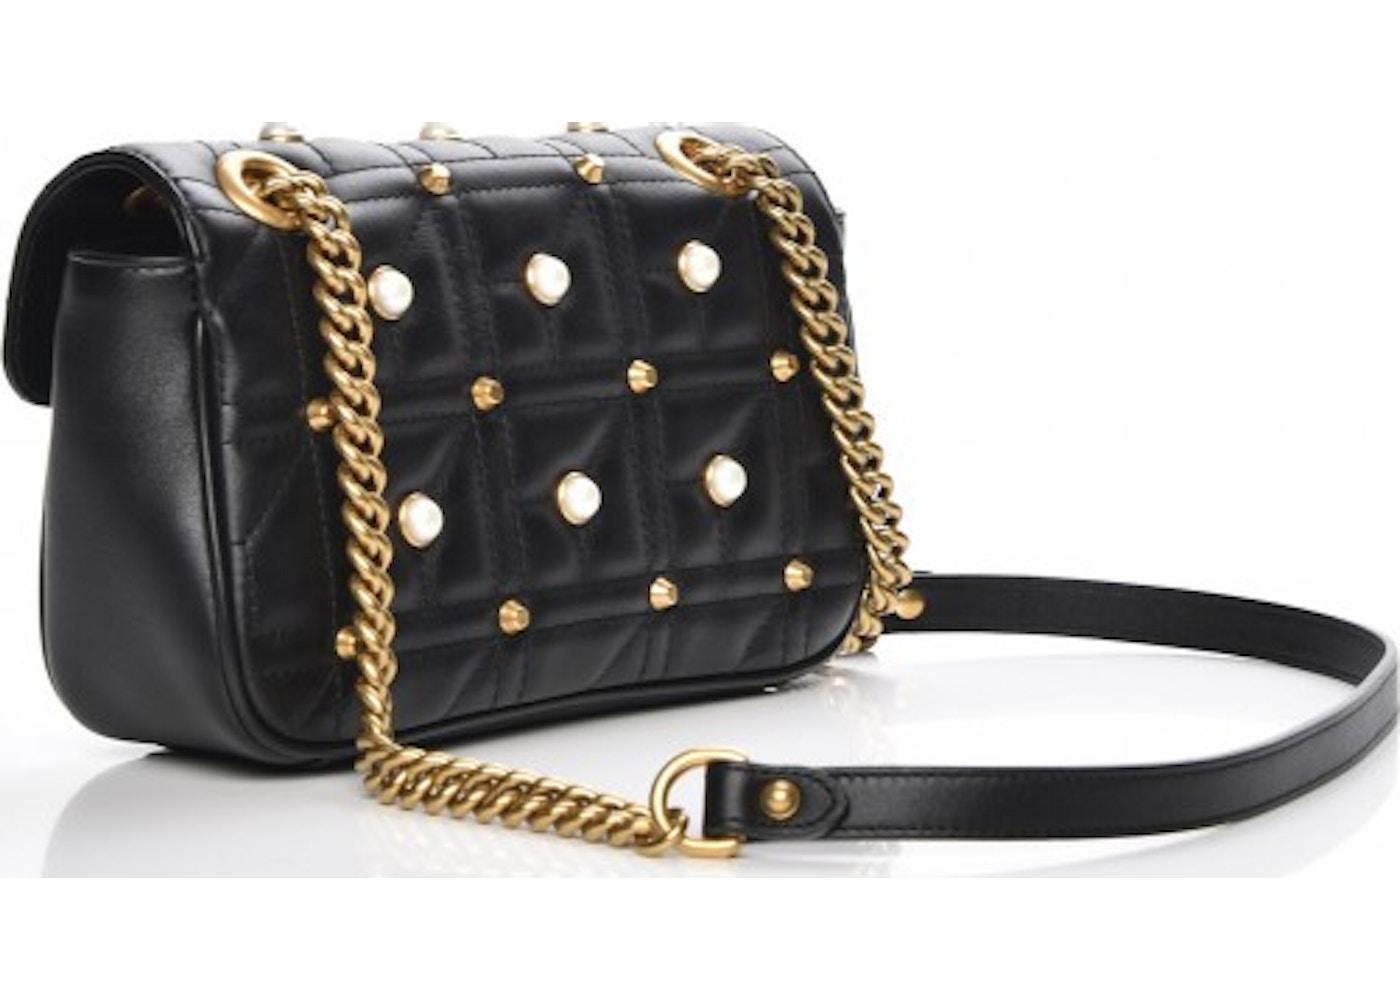 f1154f11e5f Gucci Marmont Shoulder Bag Matelasse Pearl Studded Mini Black